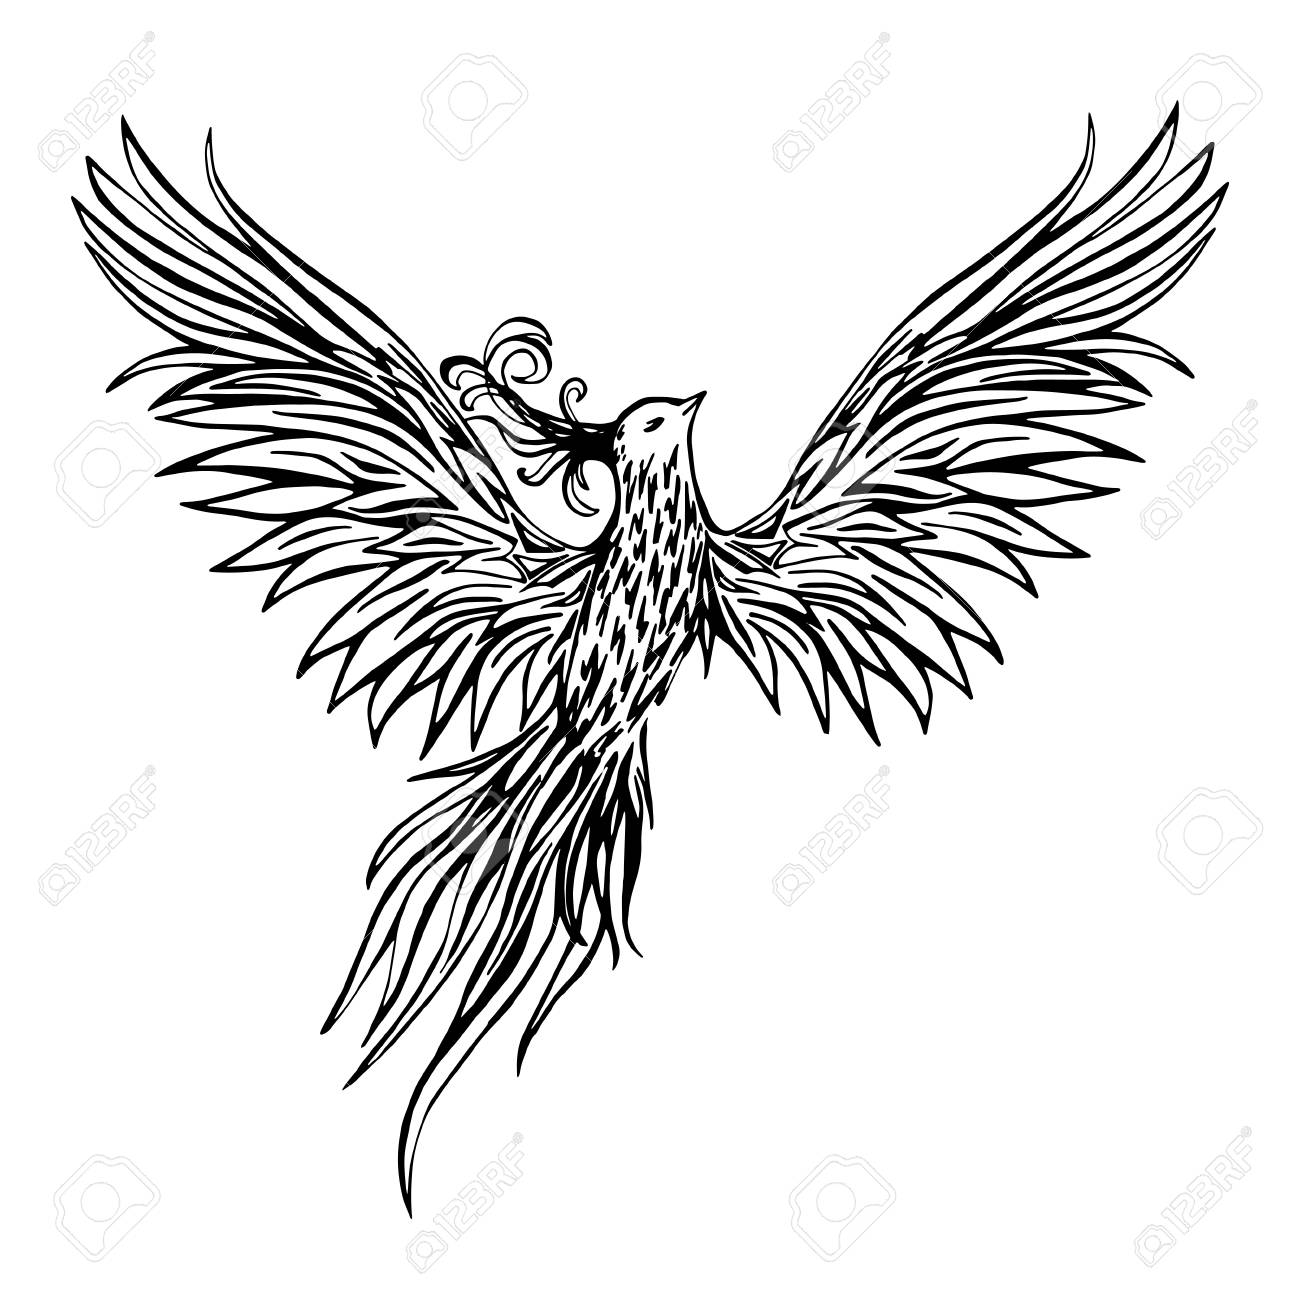 1300x1300 Hand Drawn Chinese Peacock Tattoo.asian Phoenix Fire Bird Tattoo